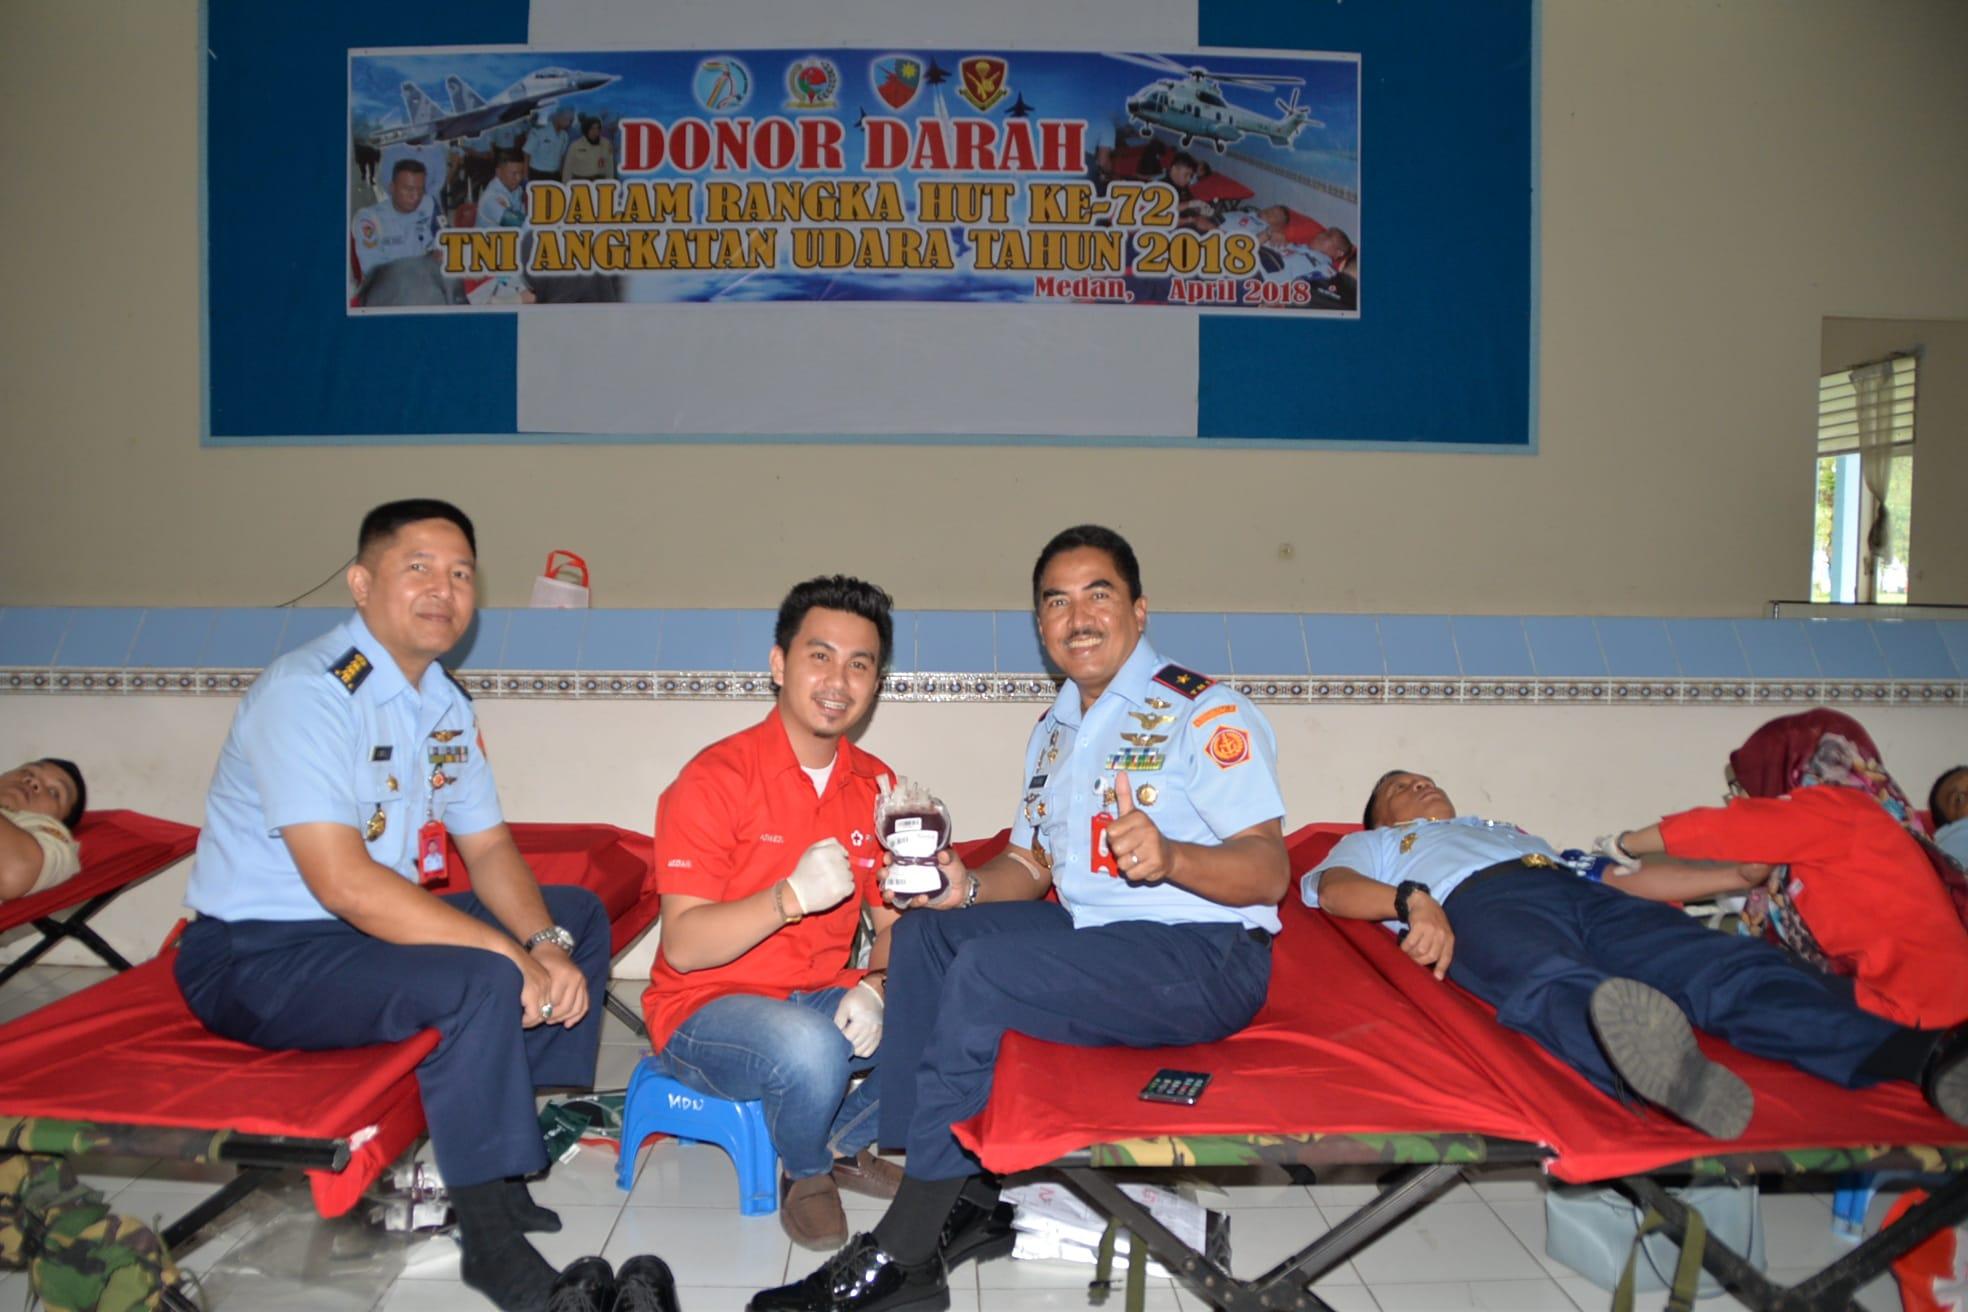 TNI AU Se-kota Medan Gelar Donor Darah Dalam Rangka Memperingati HUT TNI AU ke-72